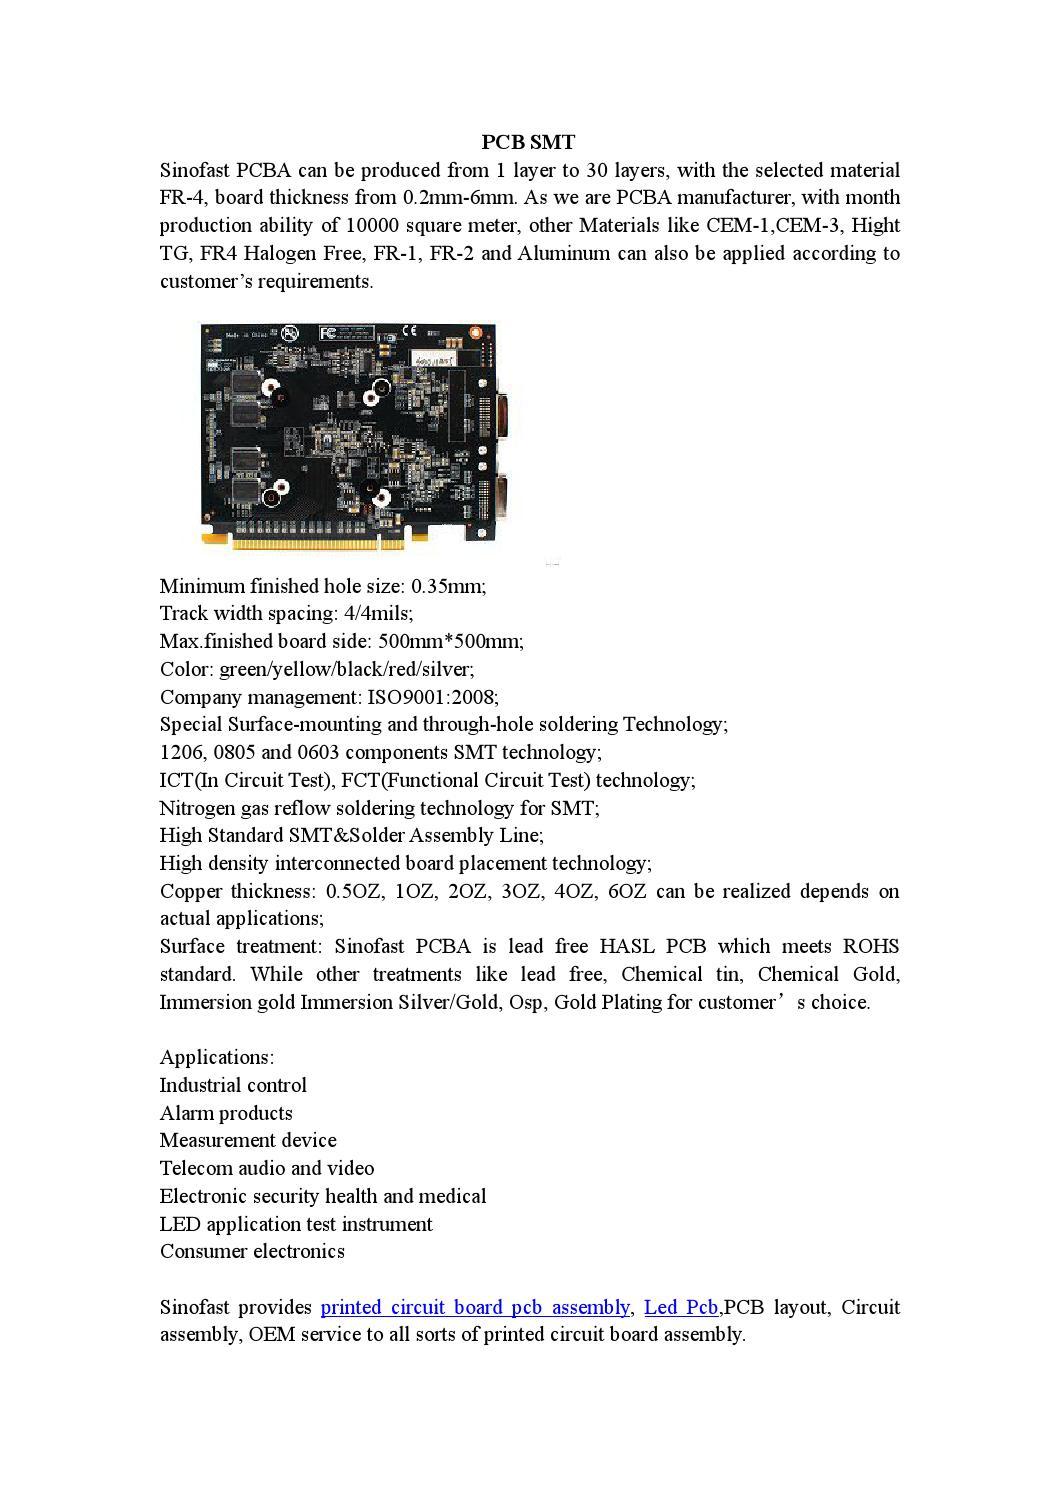 Pcb Smt By Shenzhen Sinofast Electronics Coltd Issuu Fr4 Eletronic Printed Circuit Board Design Buy